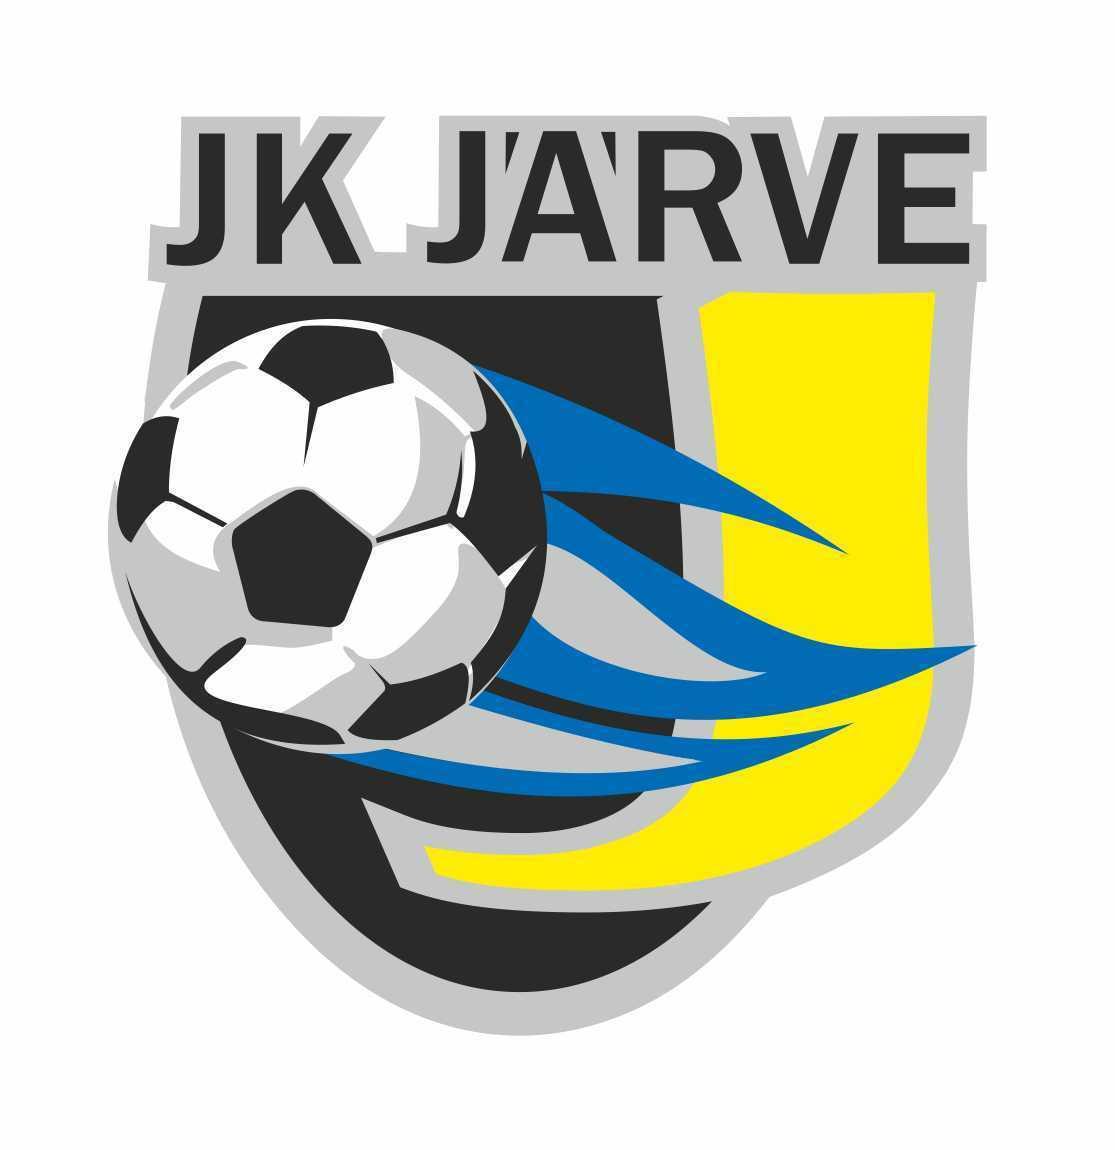 Kohtla-Järve JK Järve logo